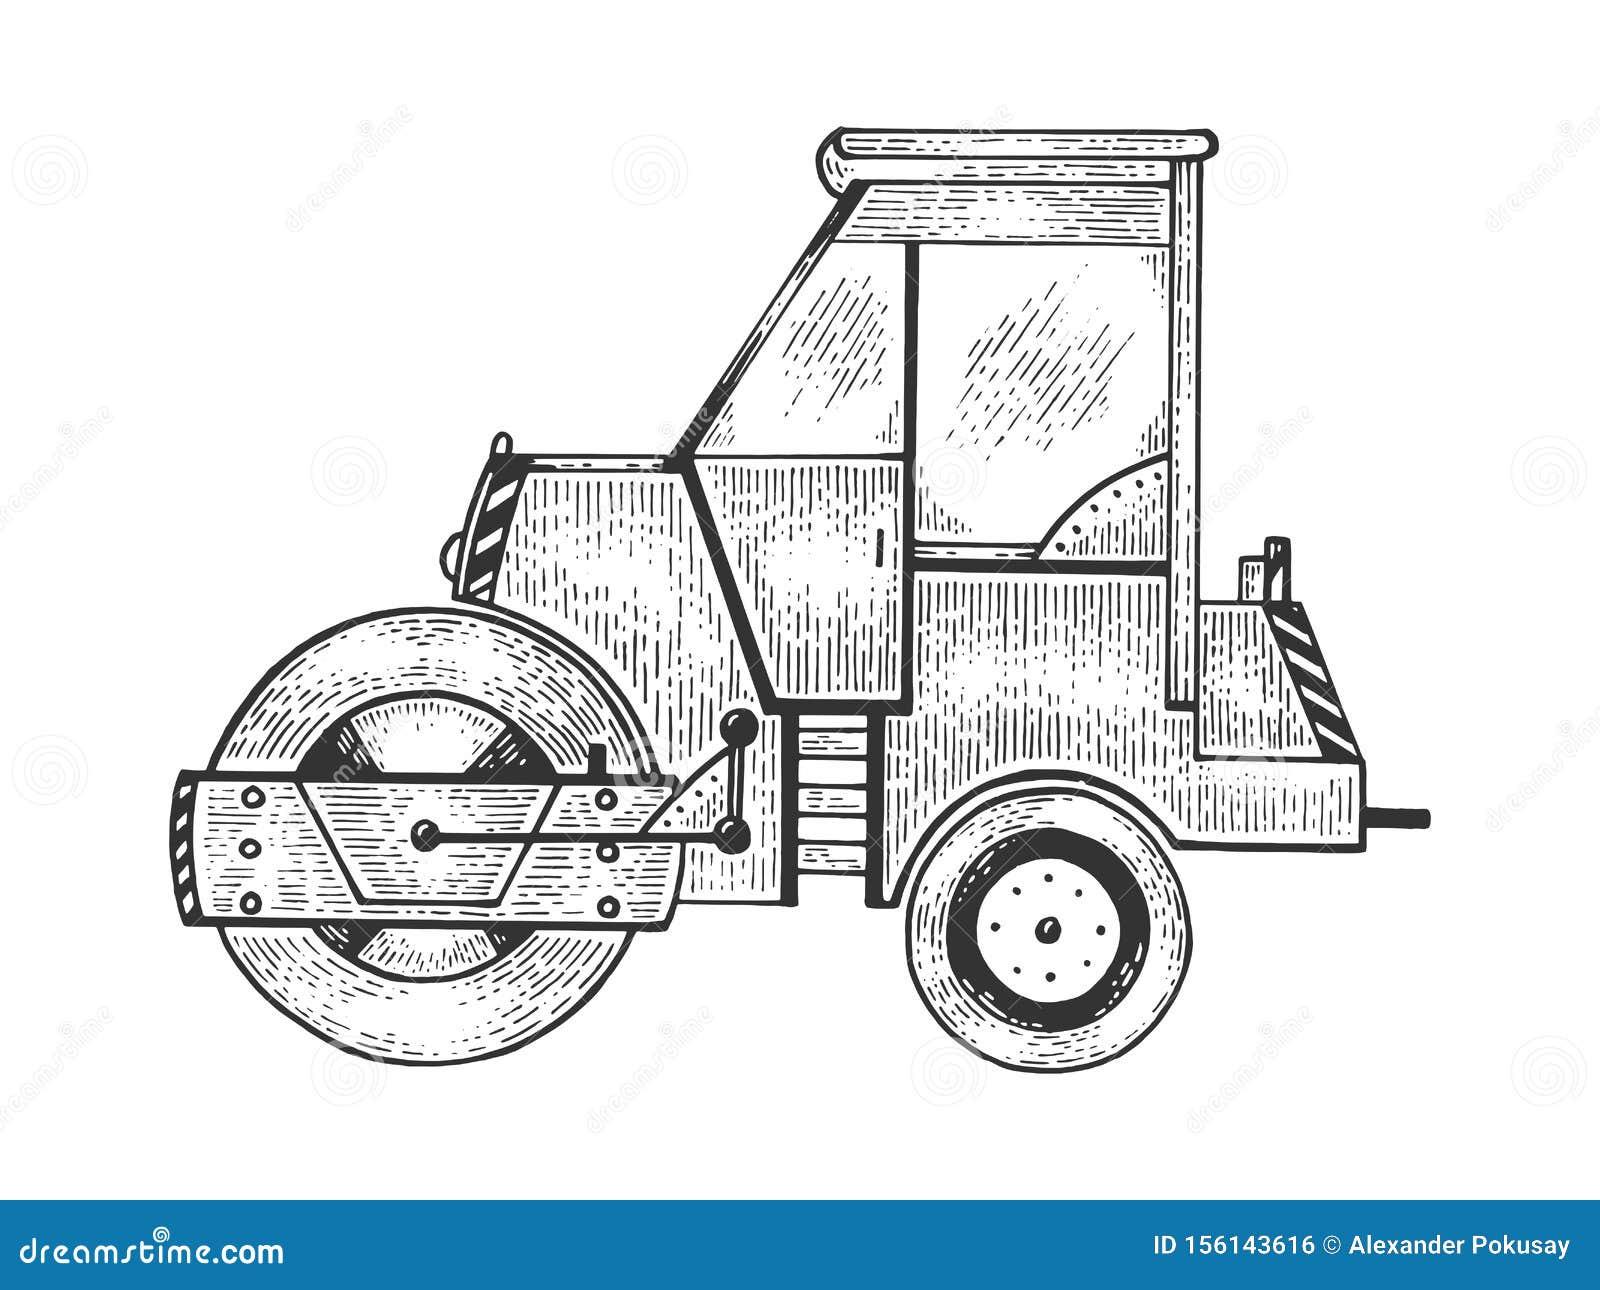 Road roller tractor machine sketch engraving